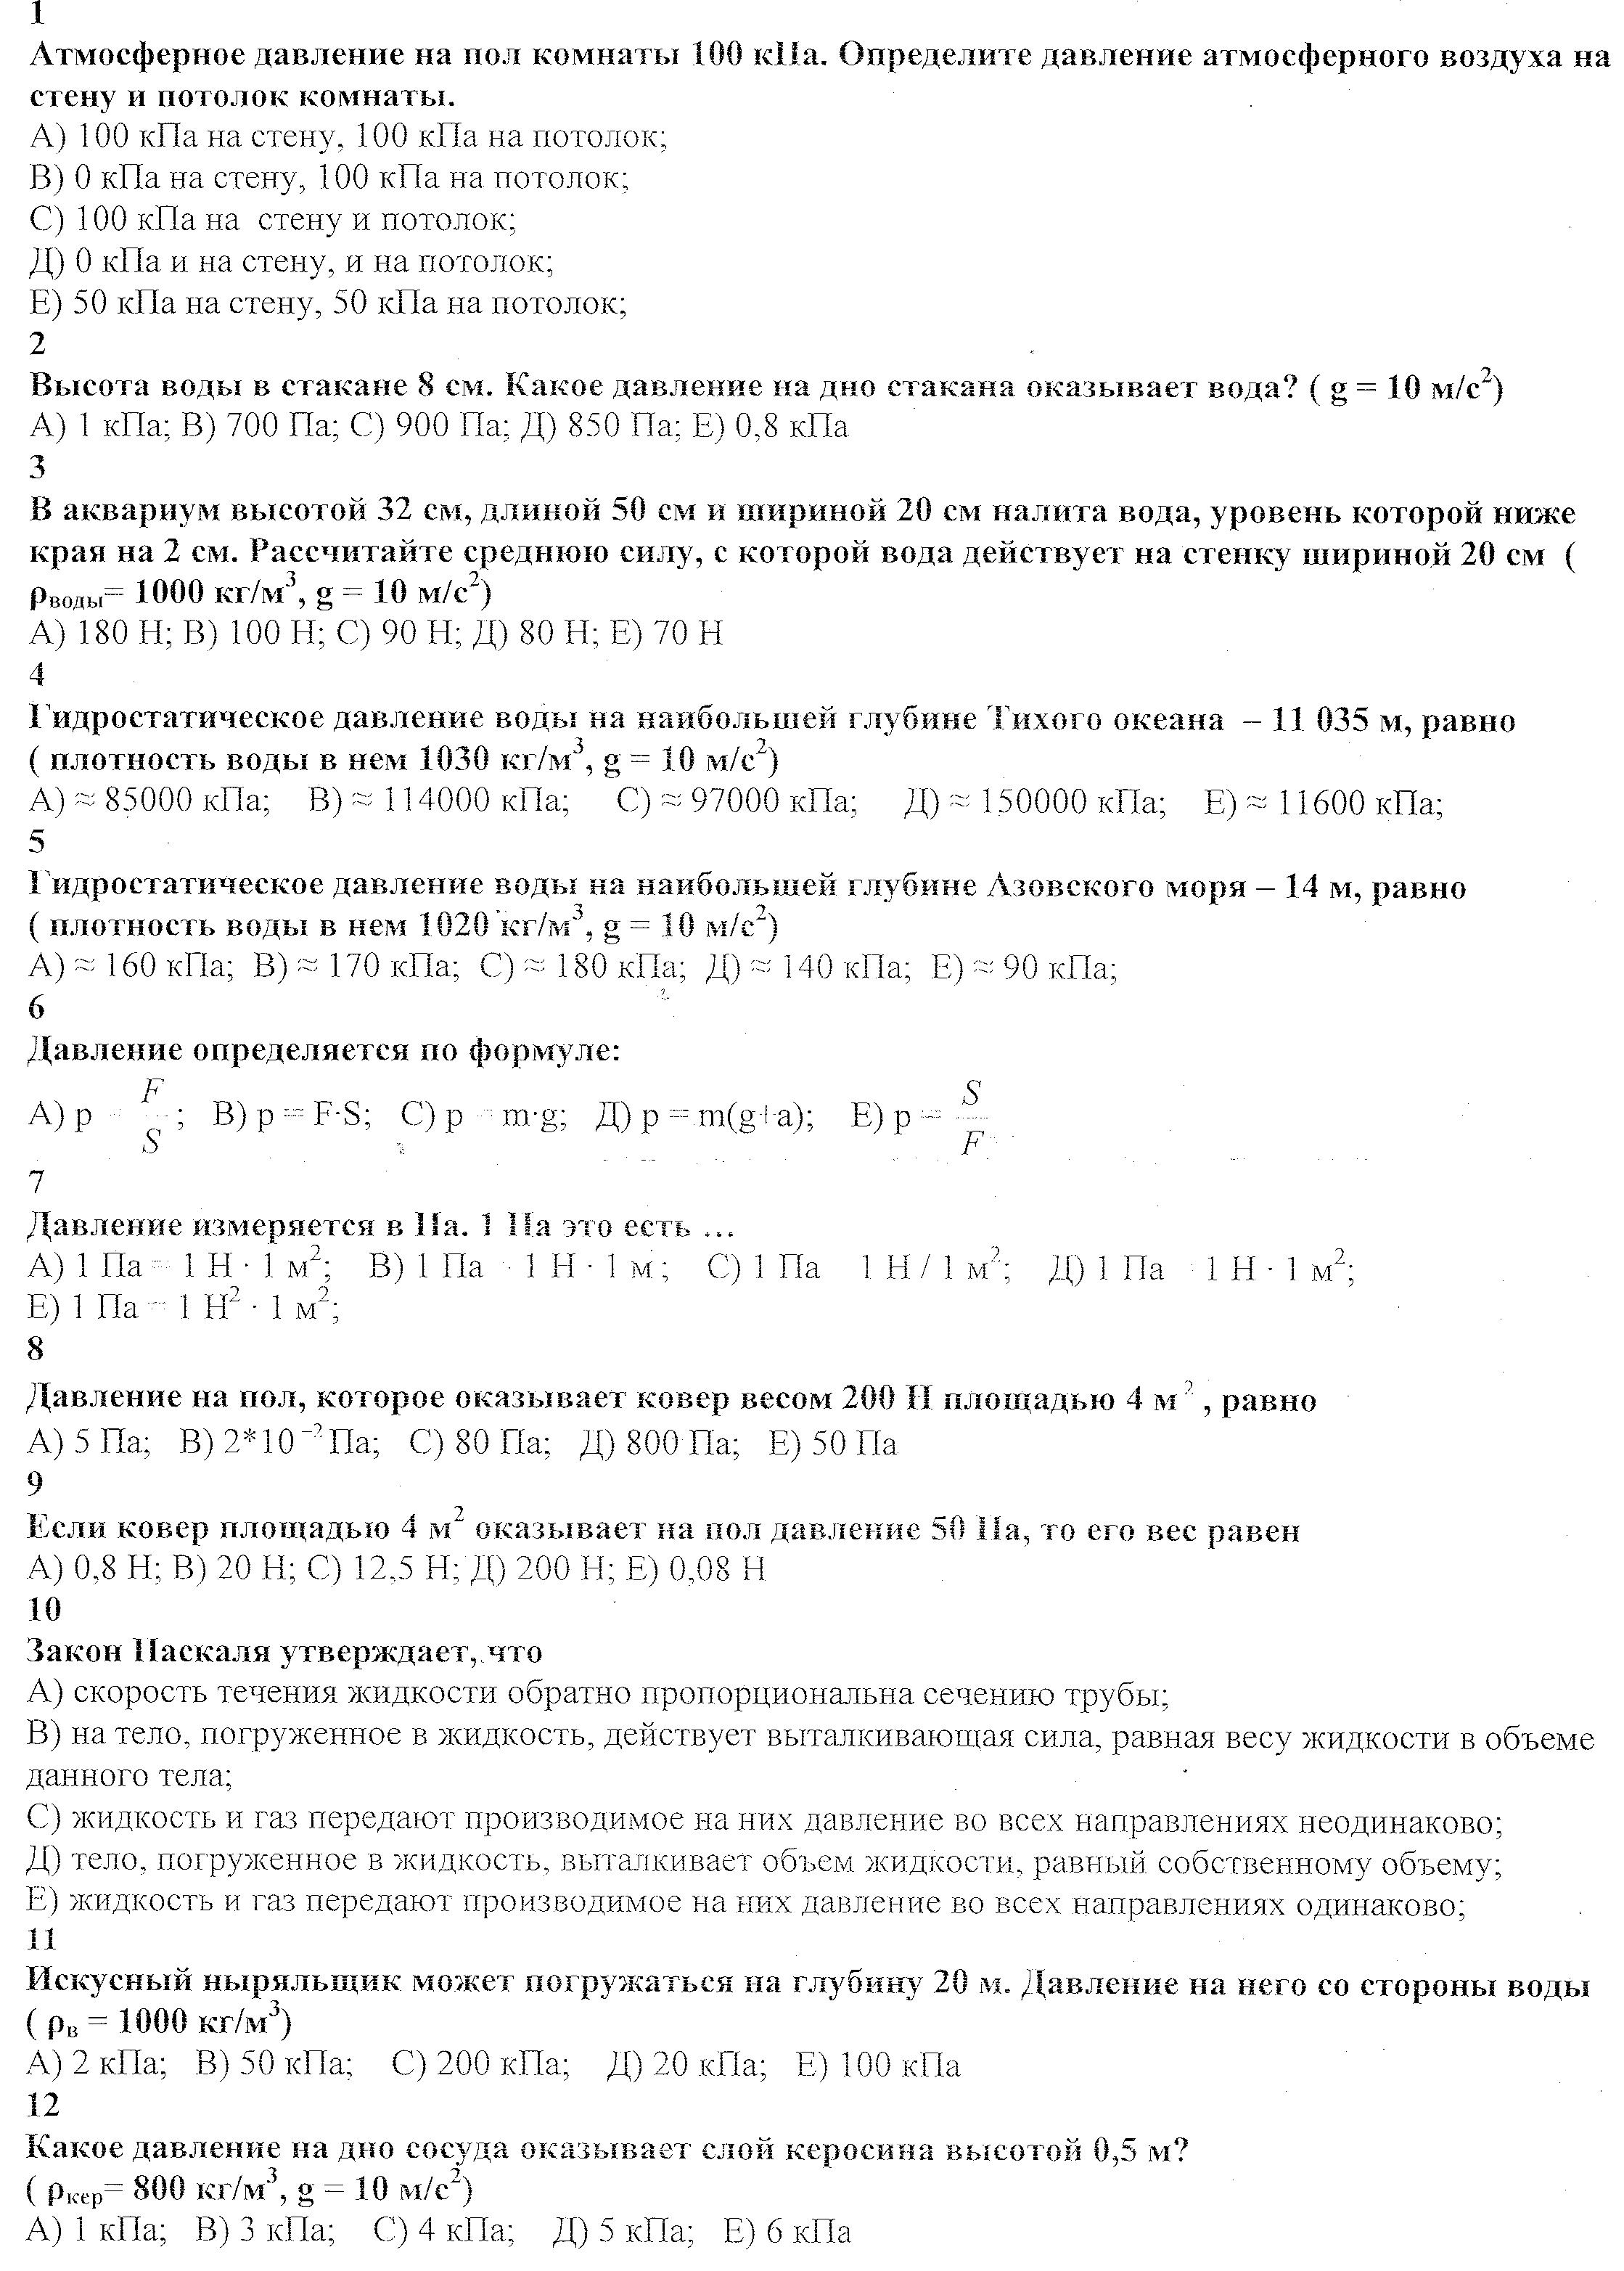 C:\Documents and Settings\Admin\My Documents\Мои результаты сканировани\сканирование0120.bmp